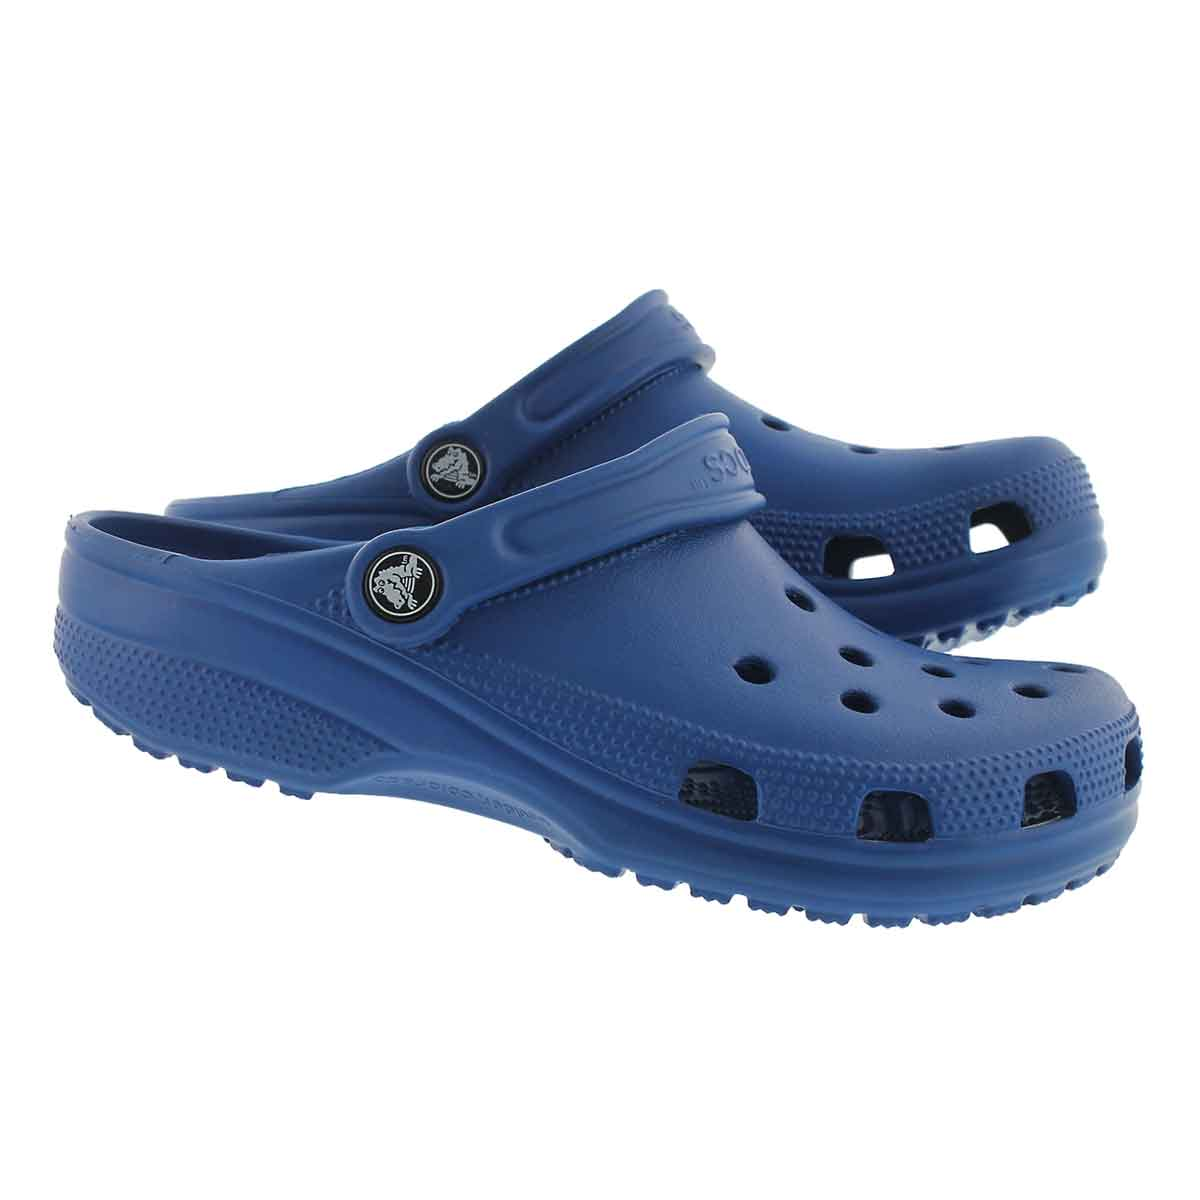 Lds Classic blue jean EVA comfort clog